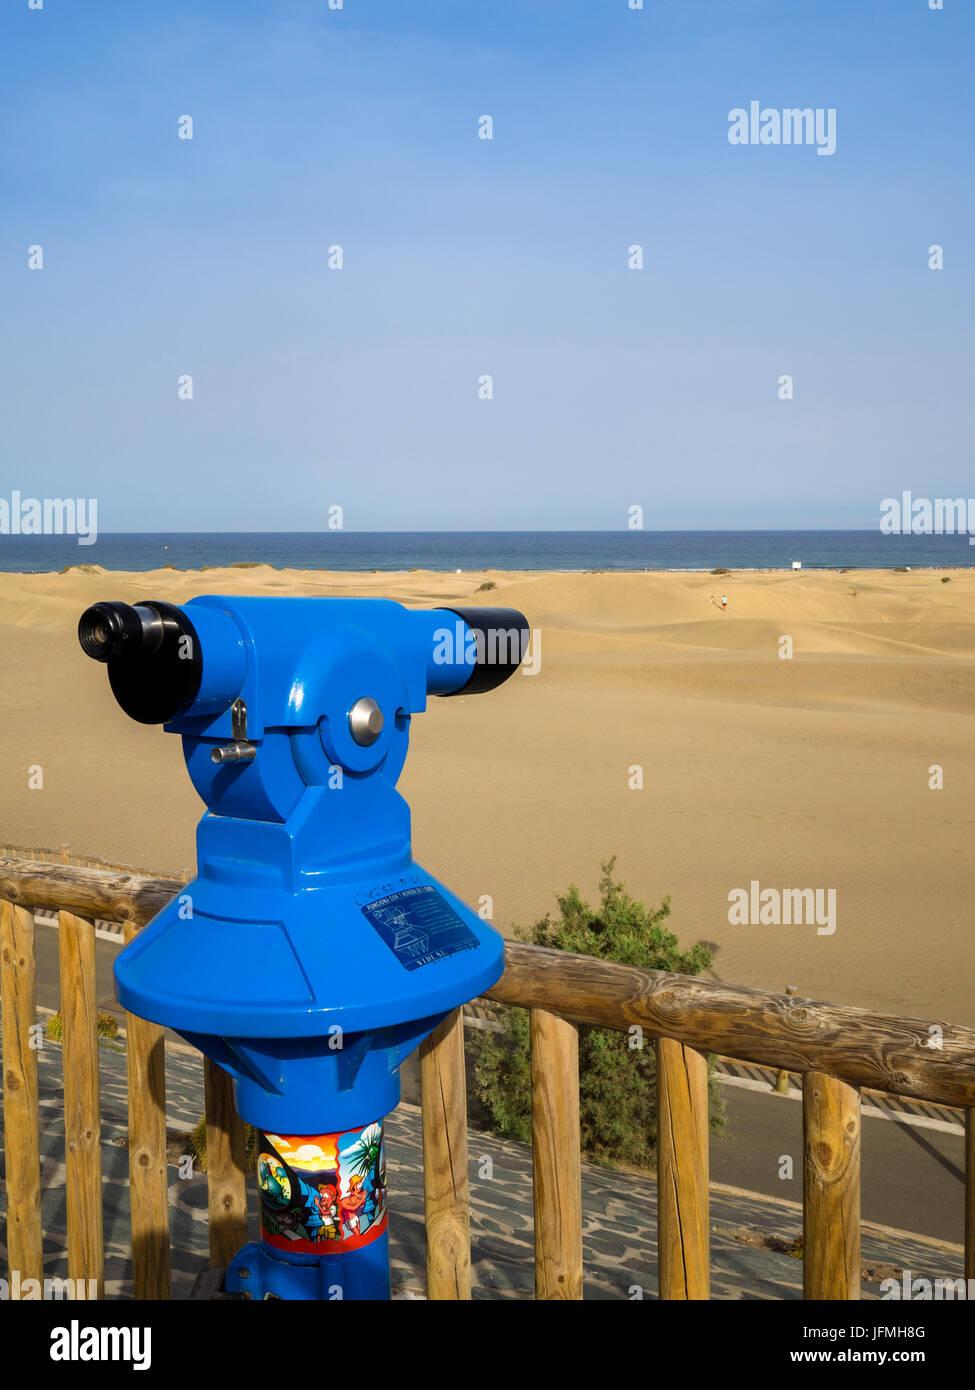 Public seaside telescope by the Dunas de Maspalomas (Sand dunes of Maspalomas), Gran Canaria, Canary Islands, Spain. - Stock Image